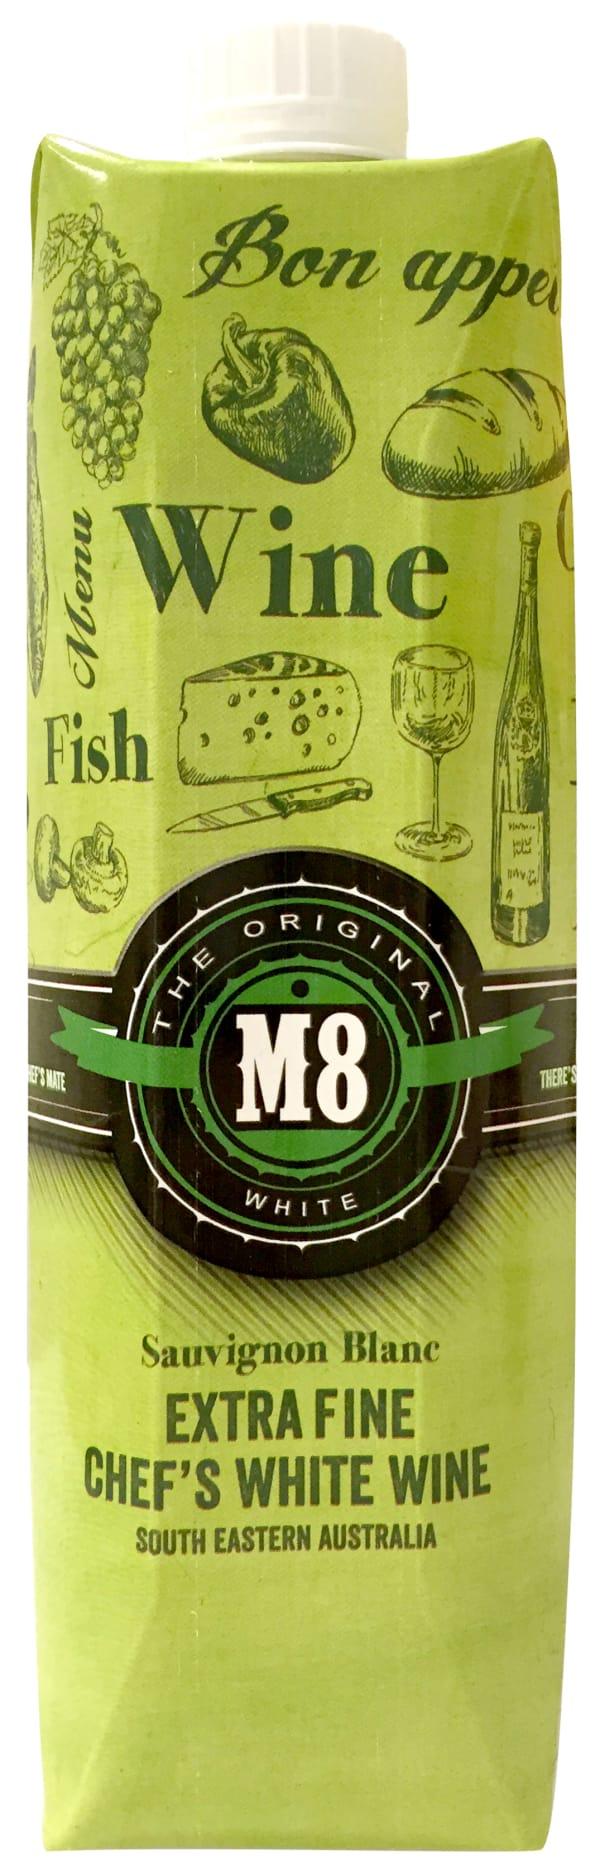 The Original M8 Sauvignon Blanc 2020 carton package